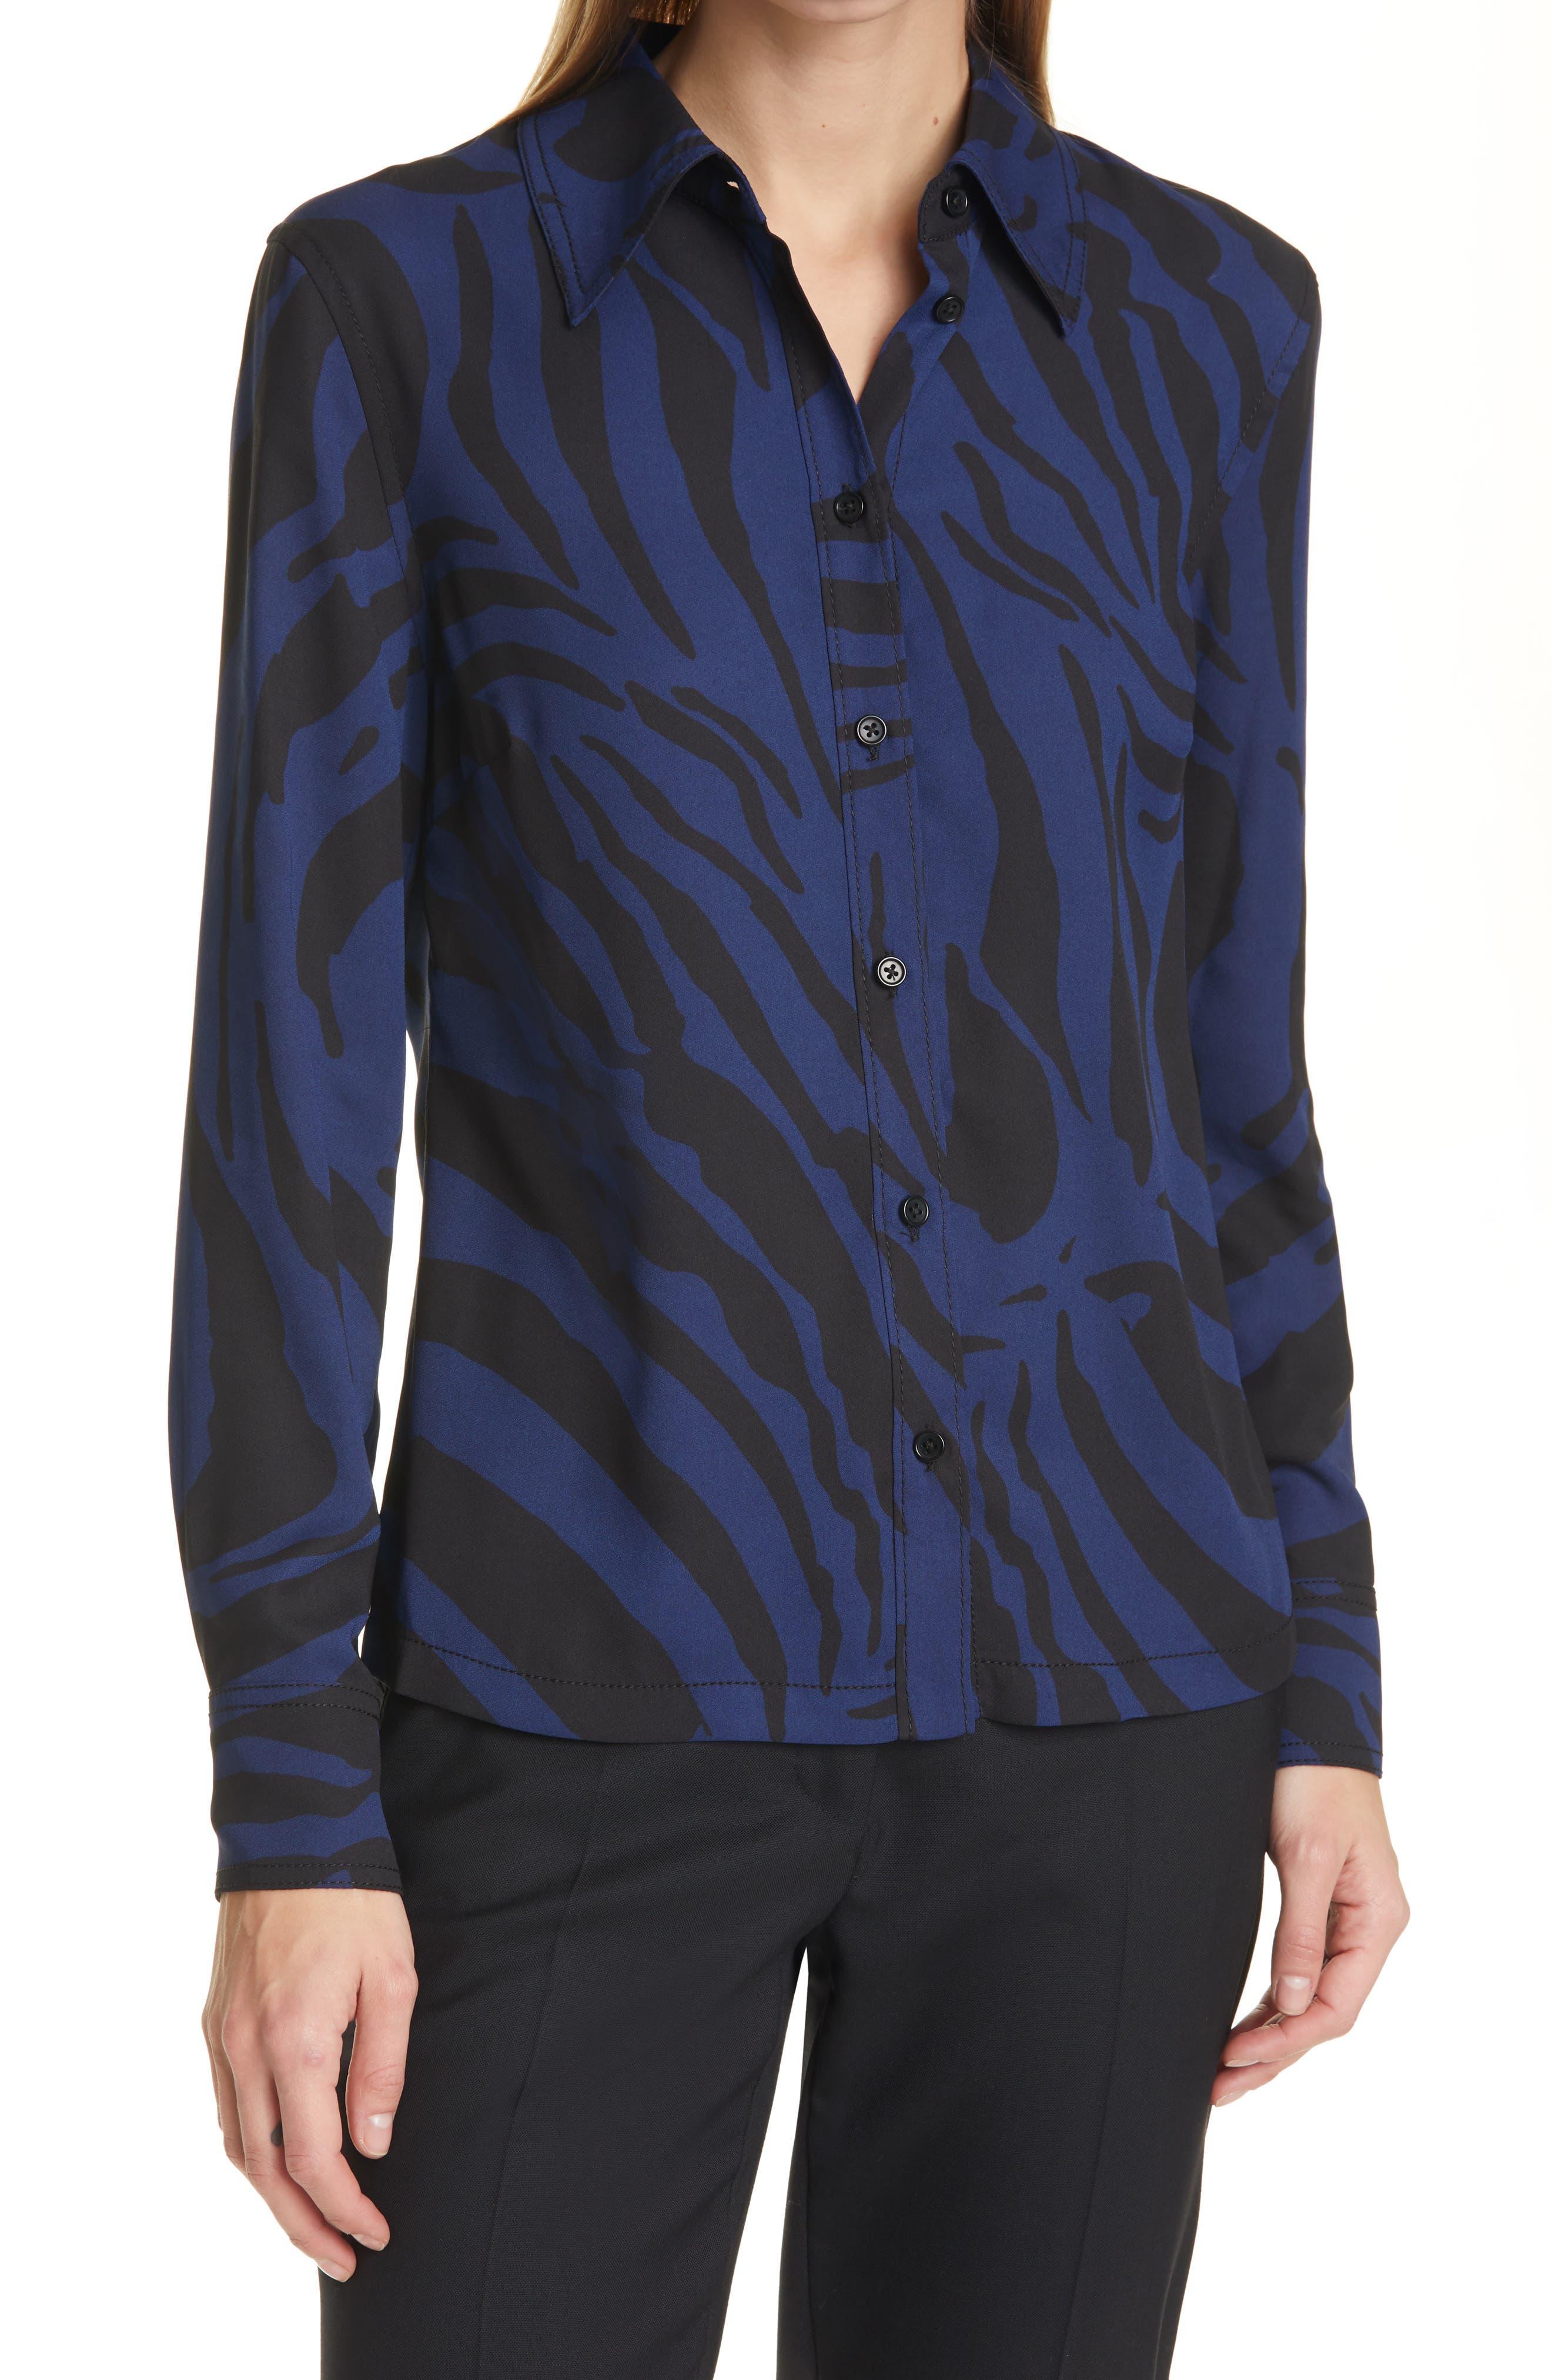 Samson Zebra Print Button-Up Shirt